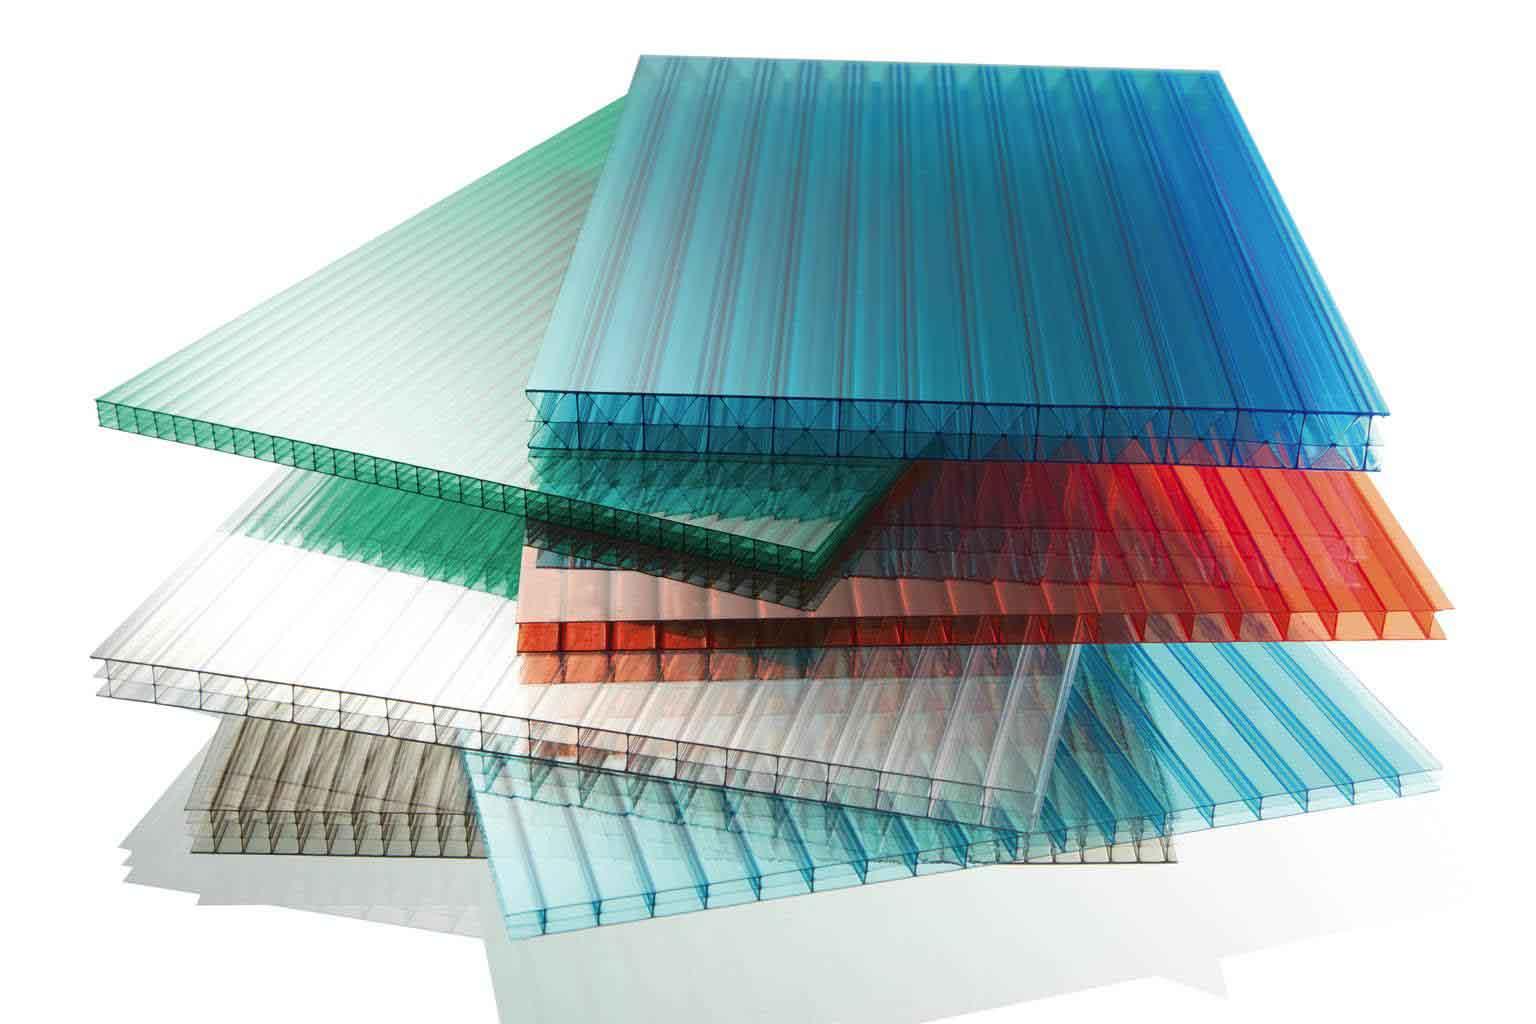 Harga Atap Polycarbonate Solarlite 5mm ASIA Toko Besi